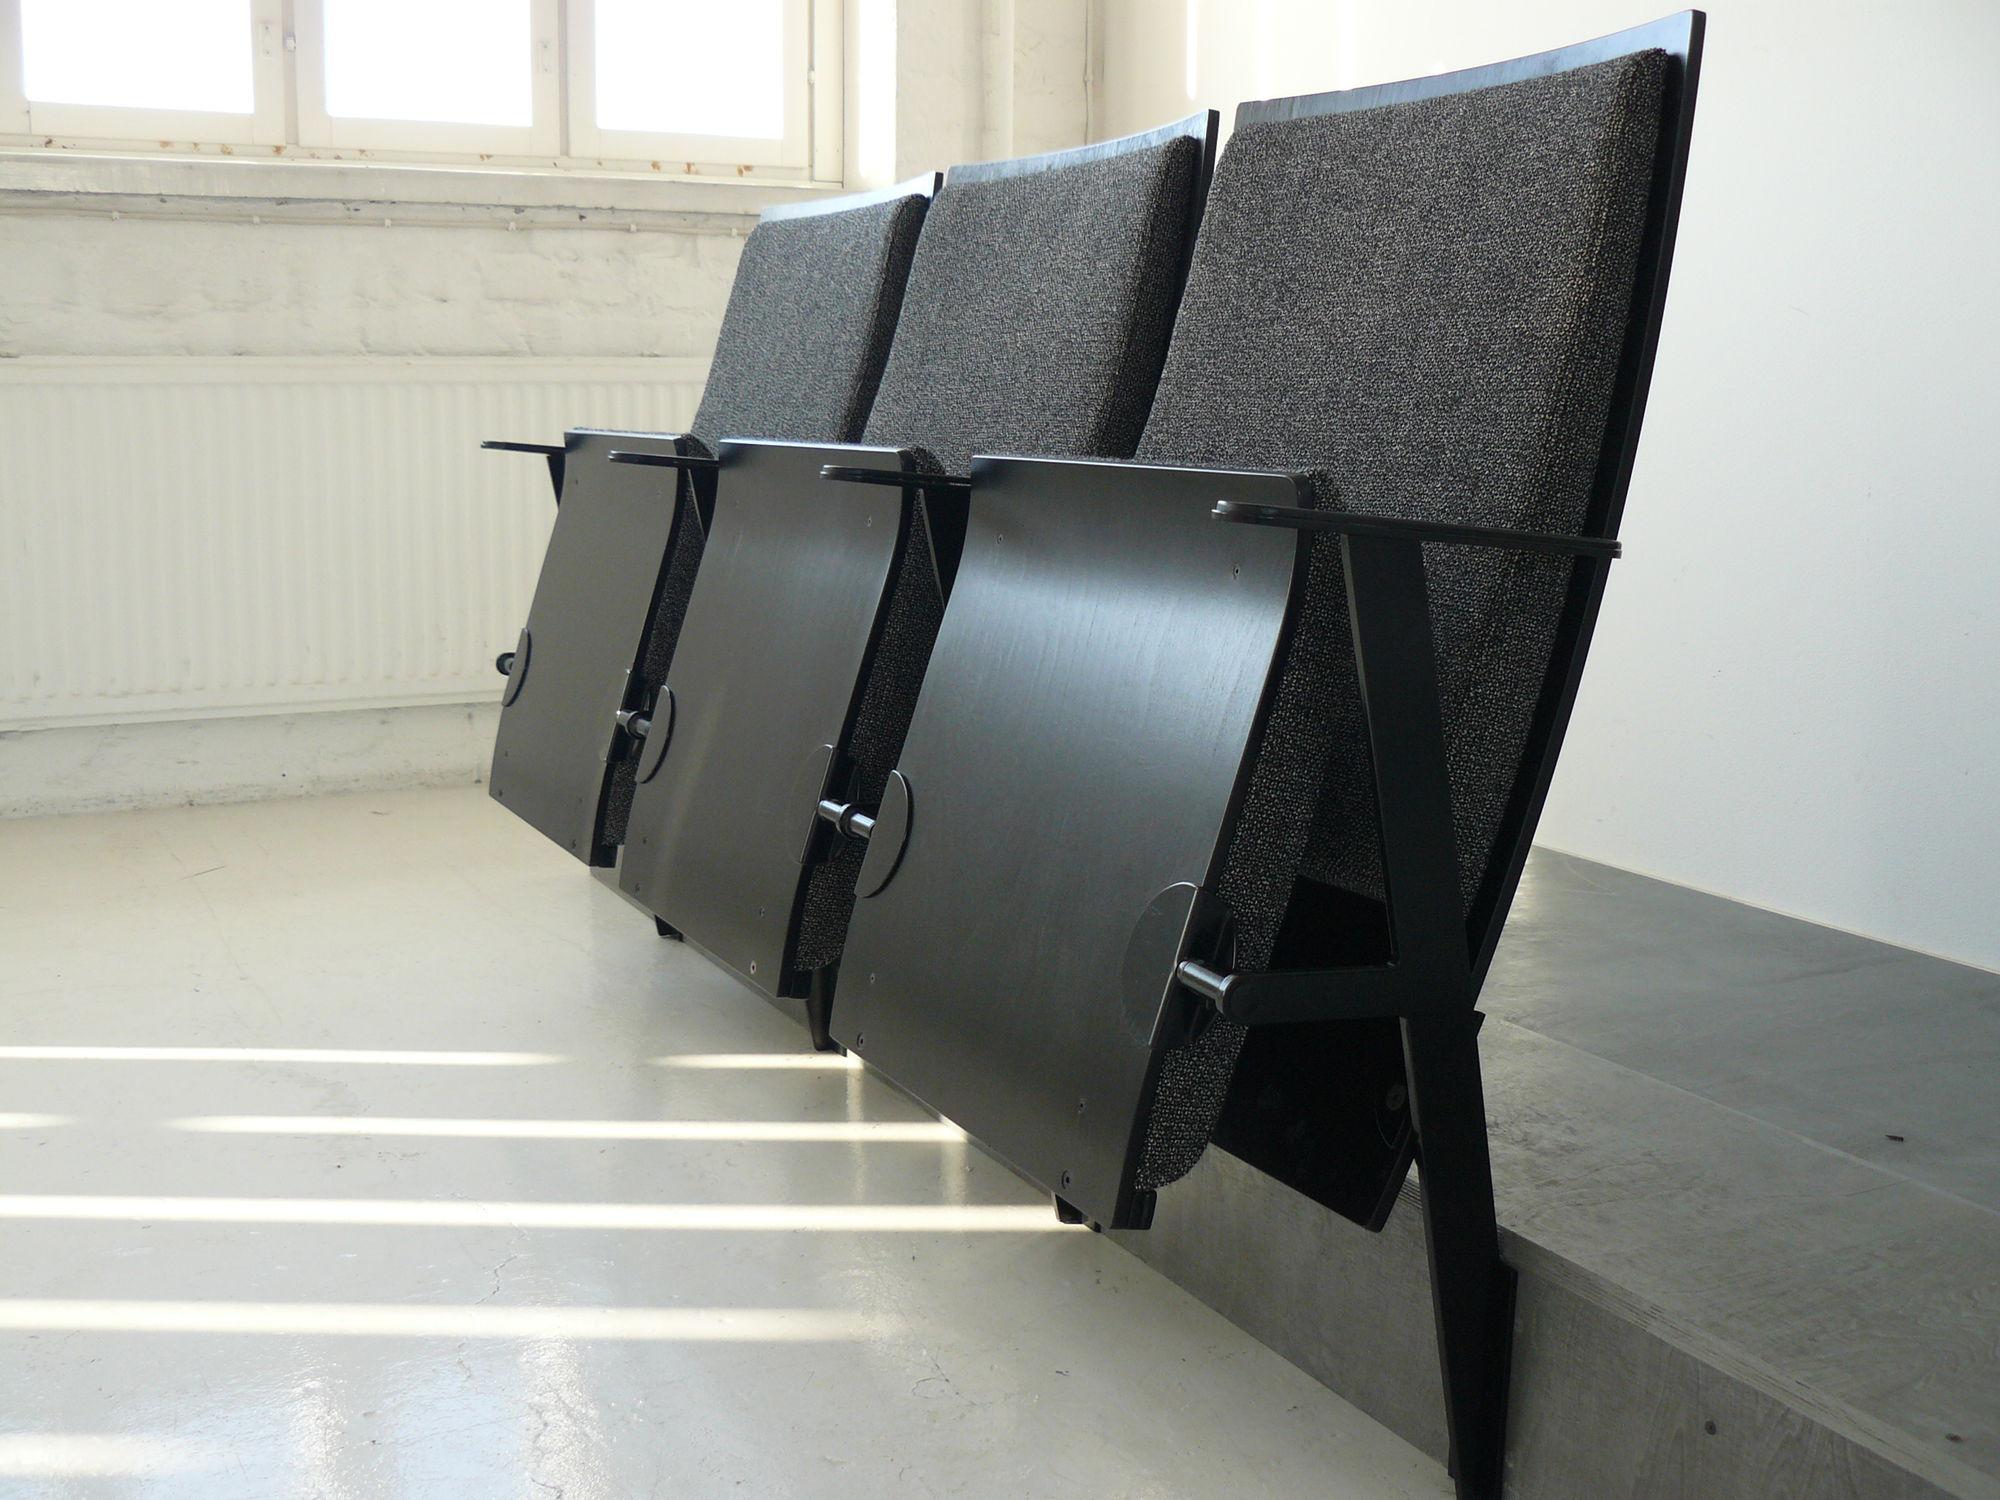 Folding Auditorium Seat With Armrests Fabric Black